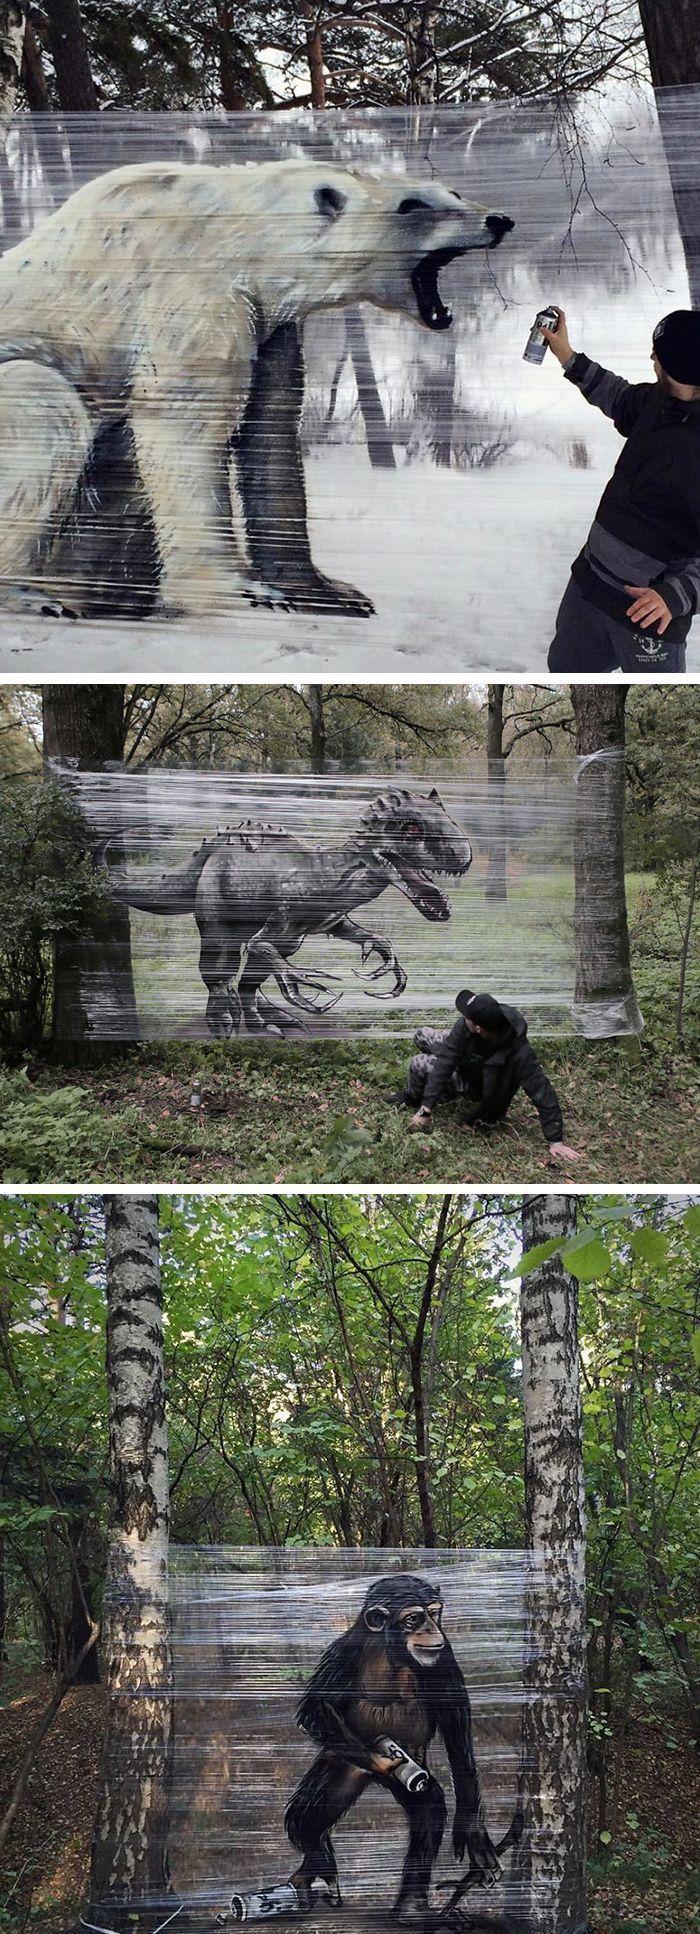 Graffiti-Künstler sprüht riesige Tiere auf Plastikfolie im Wald – Art.Pinindec